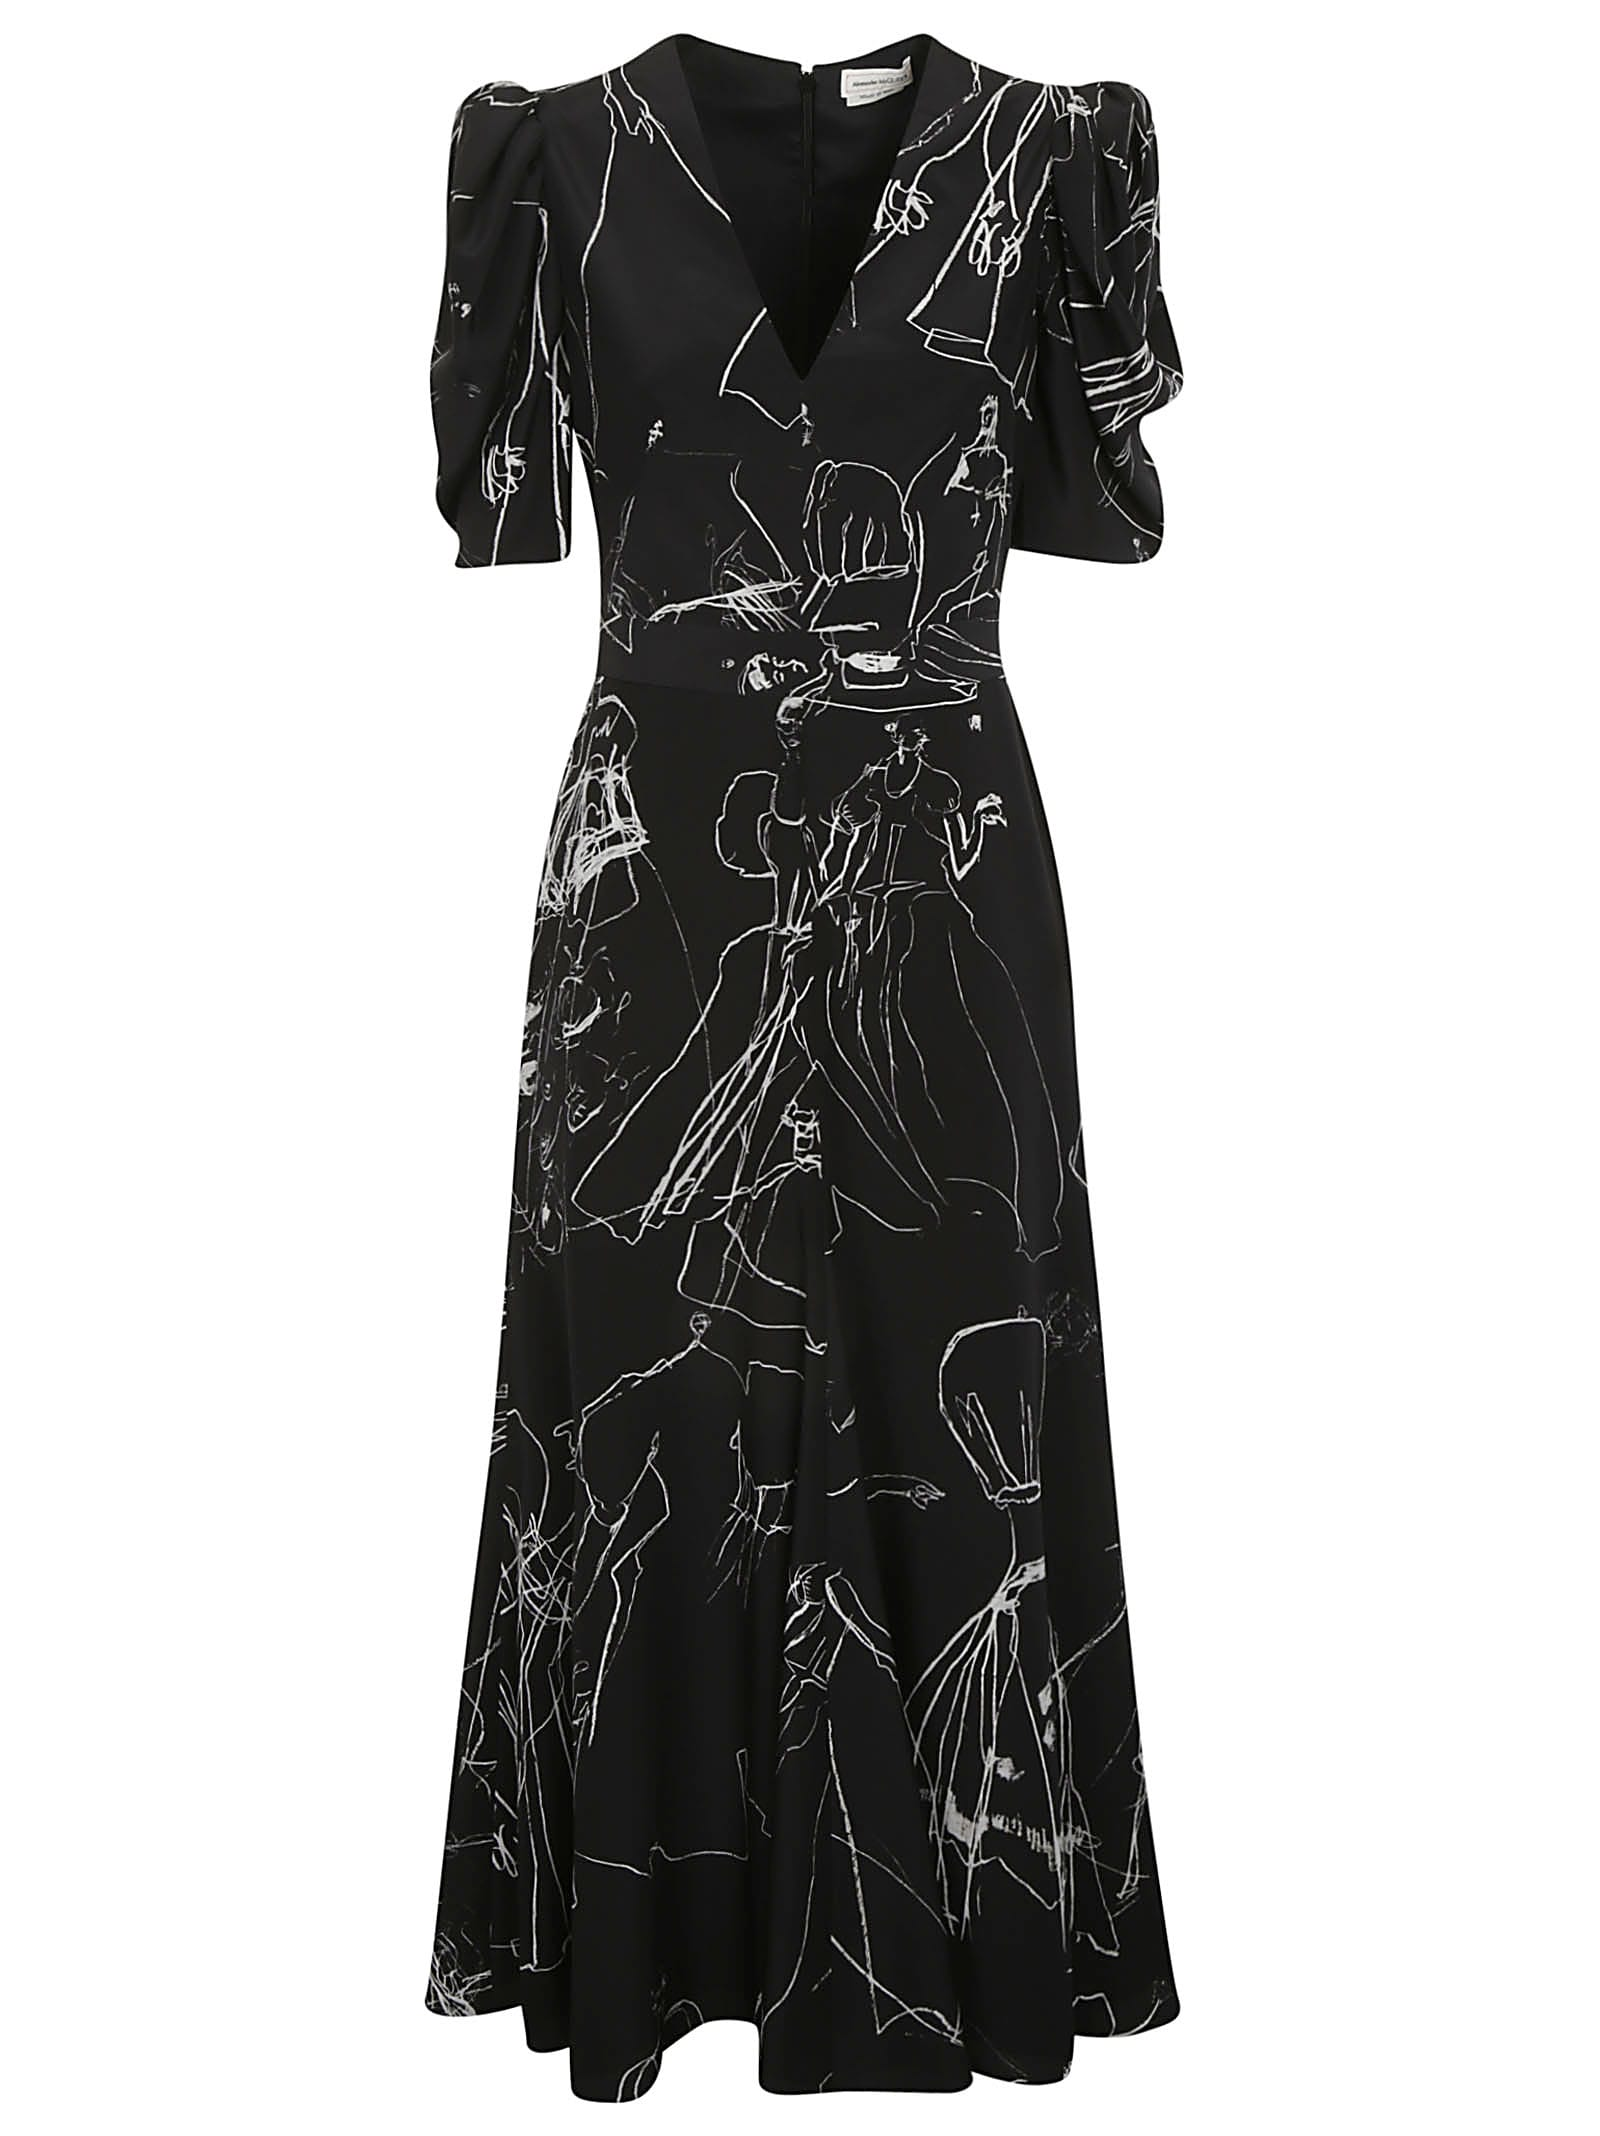 Buy Alexander McQueen Rear-zip Printed Maxi Dress online, shop Alexander McQueen with free shipping